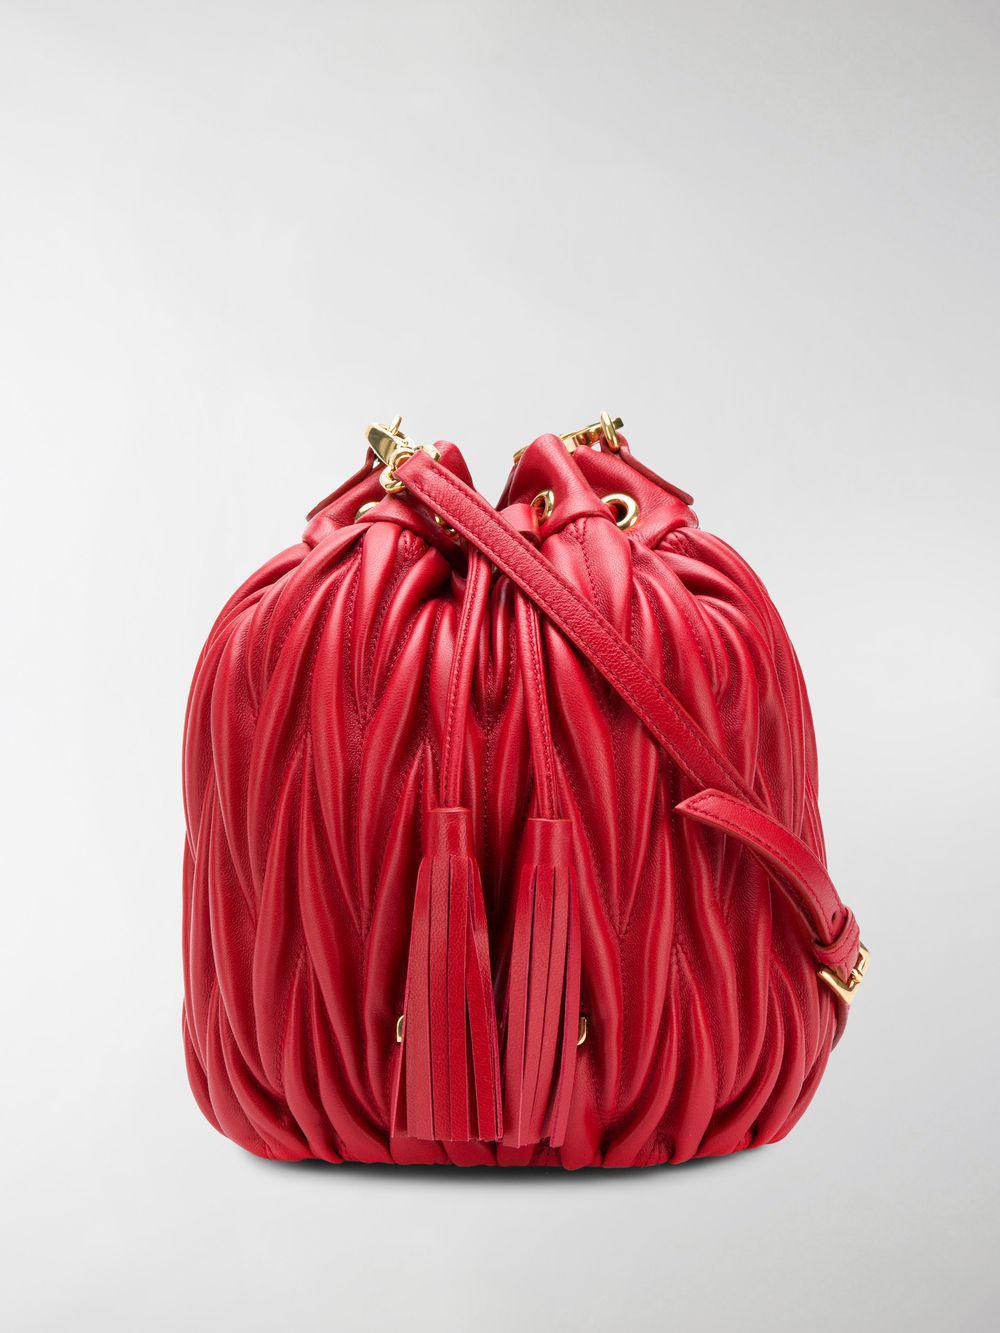 2dab5ec4c35f Miu Miu Matelassé Bucket Bag in Red - Lyst